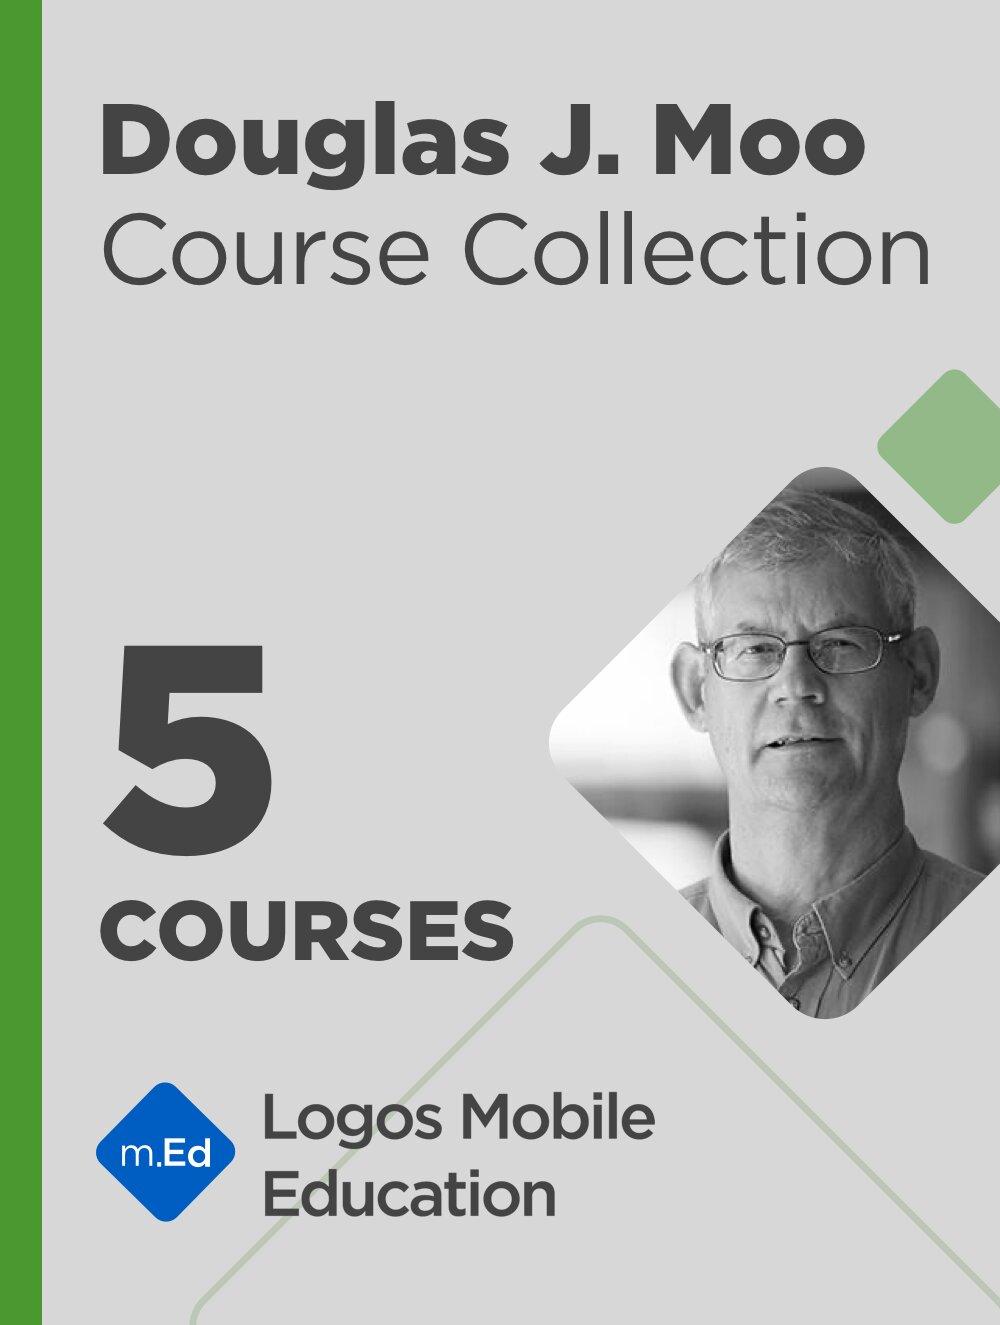 Douglas J. Moo Course Collection (5 courses)